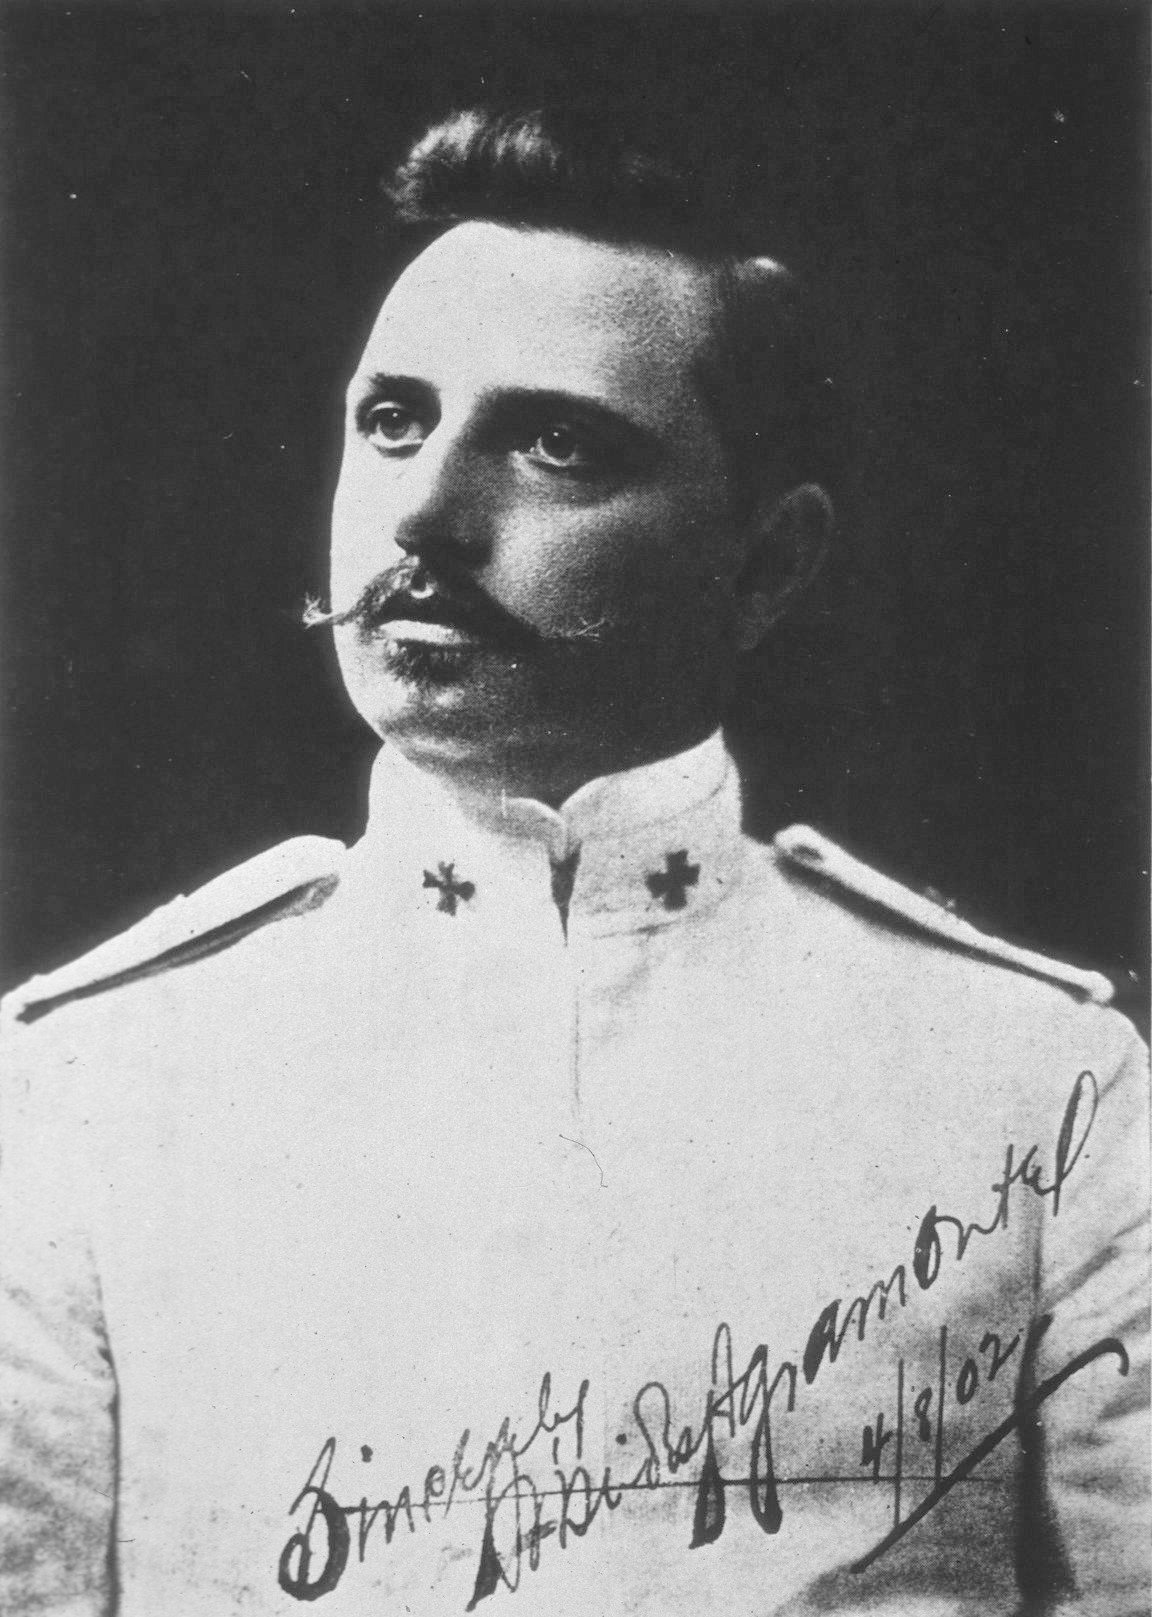 aristides agramonte biography of albert